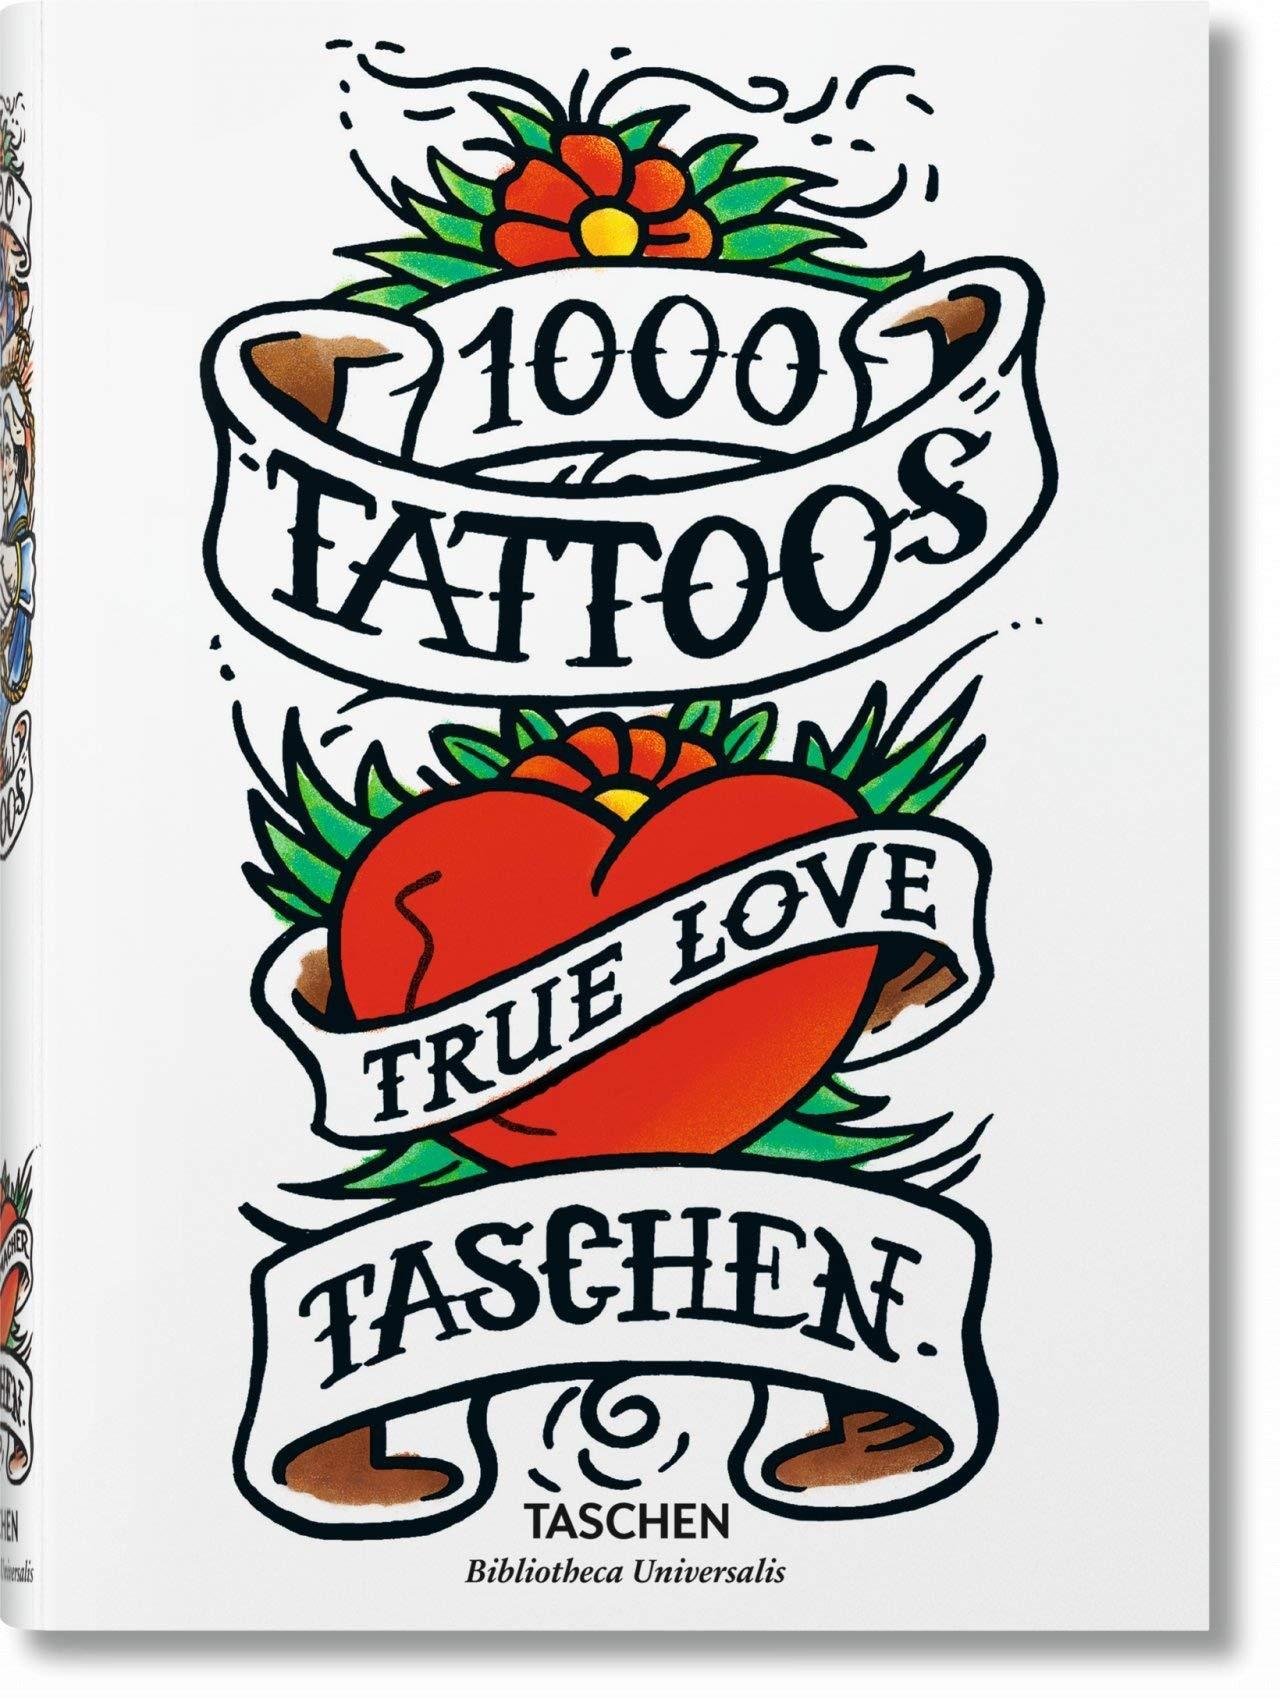 1000 Tatuajes HC: BU (Bibliotheca Universalis): Amazon.es ...